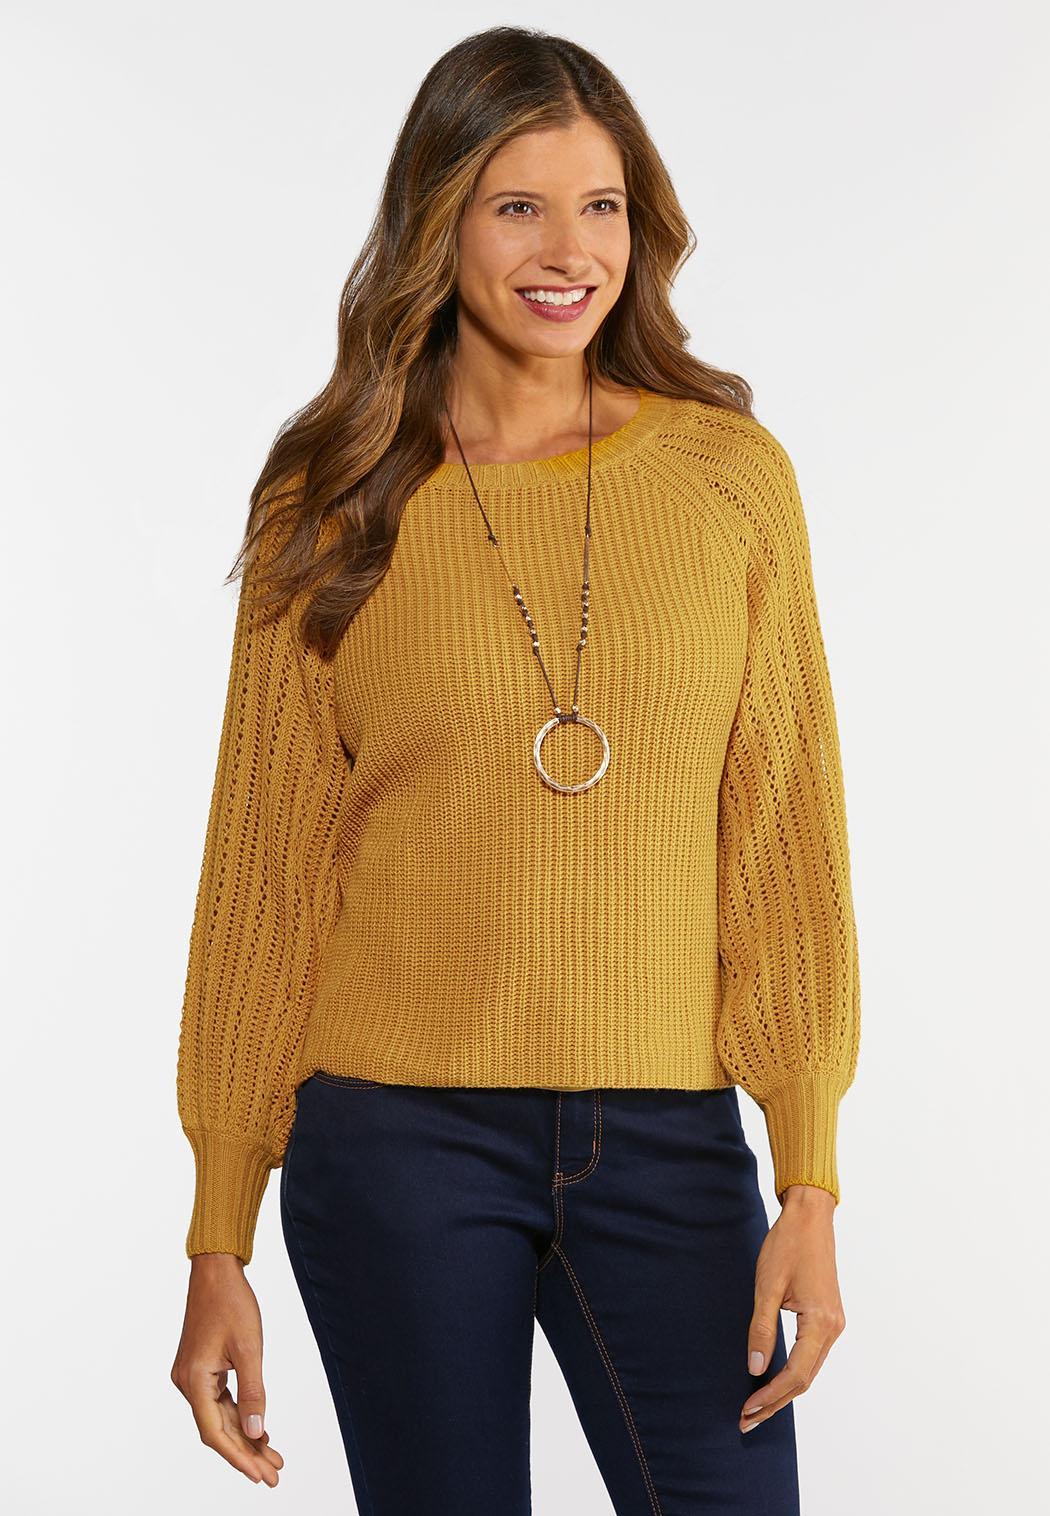 Honey Pullover Sweater